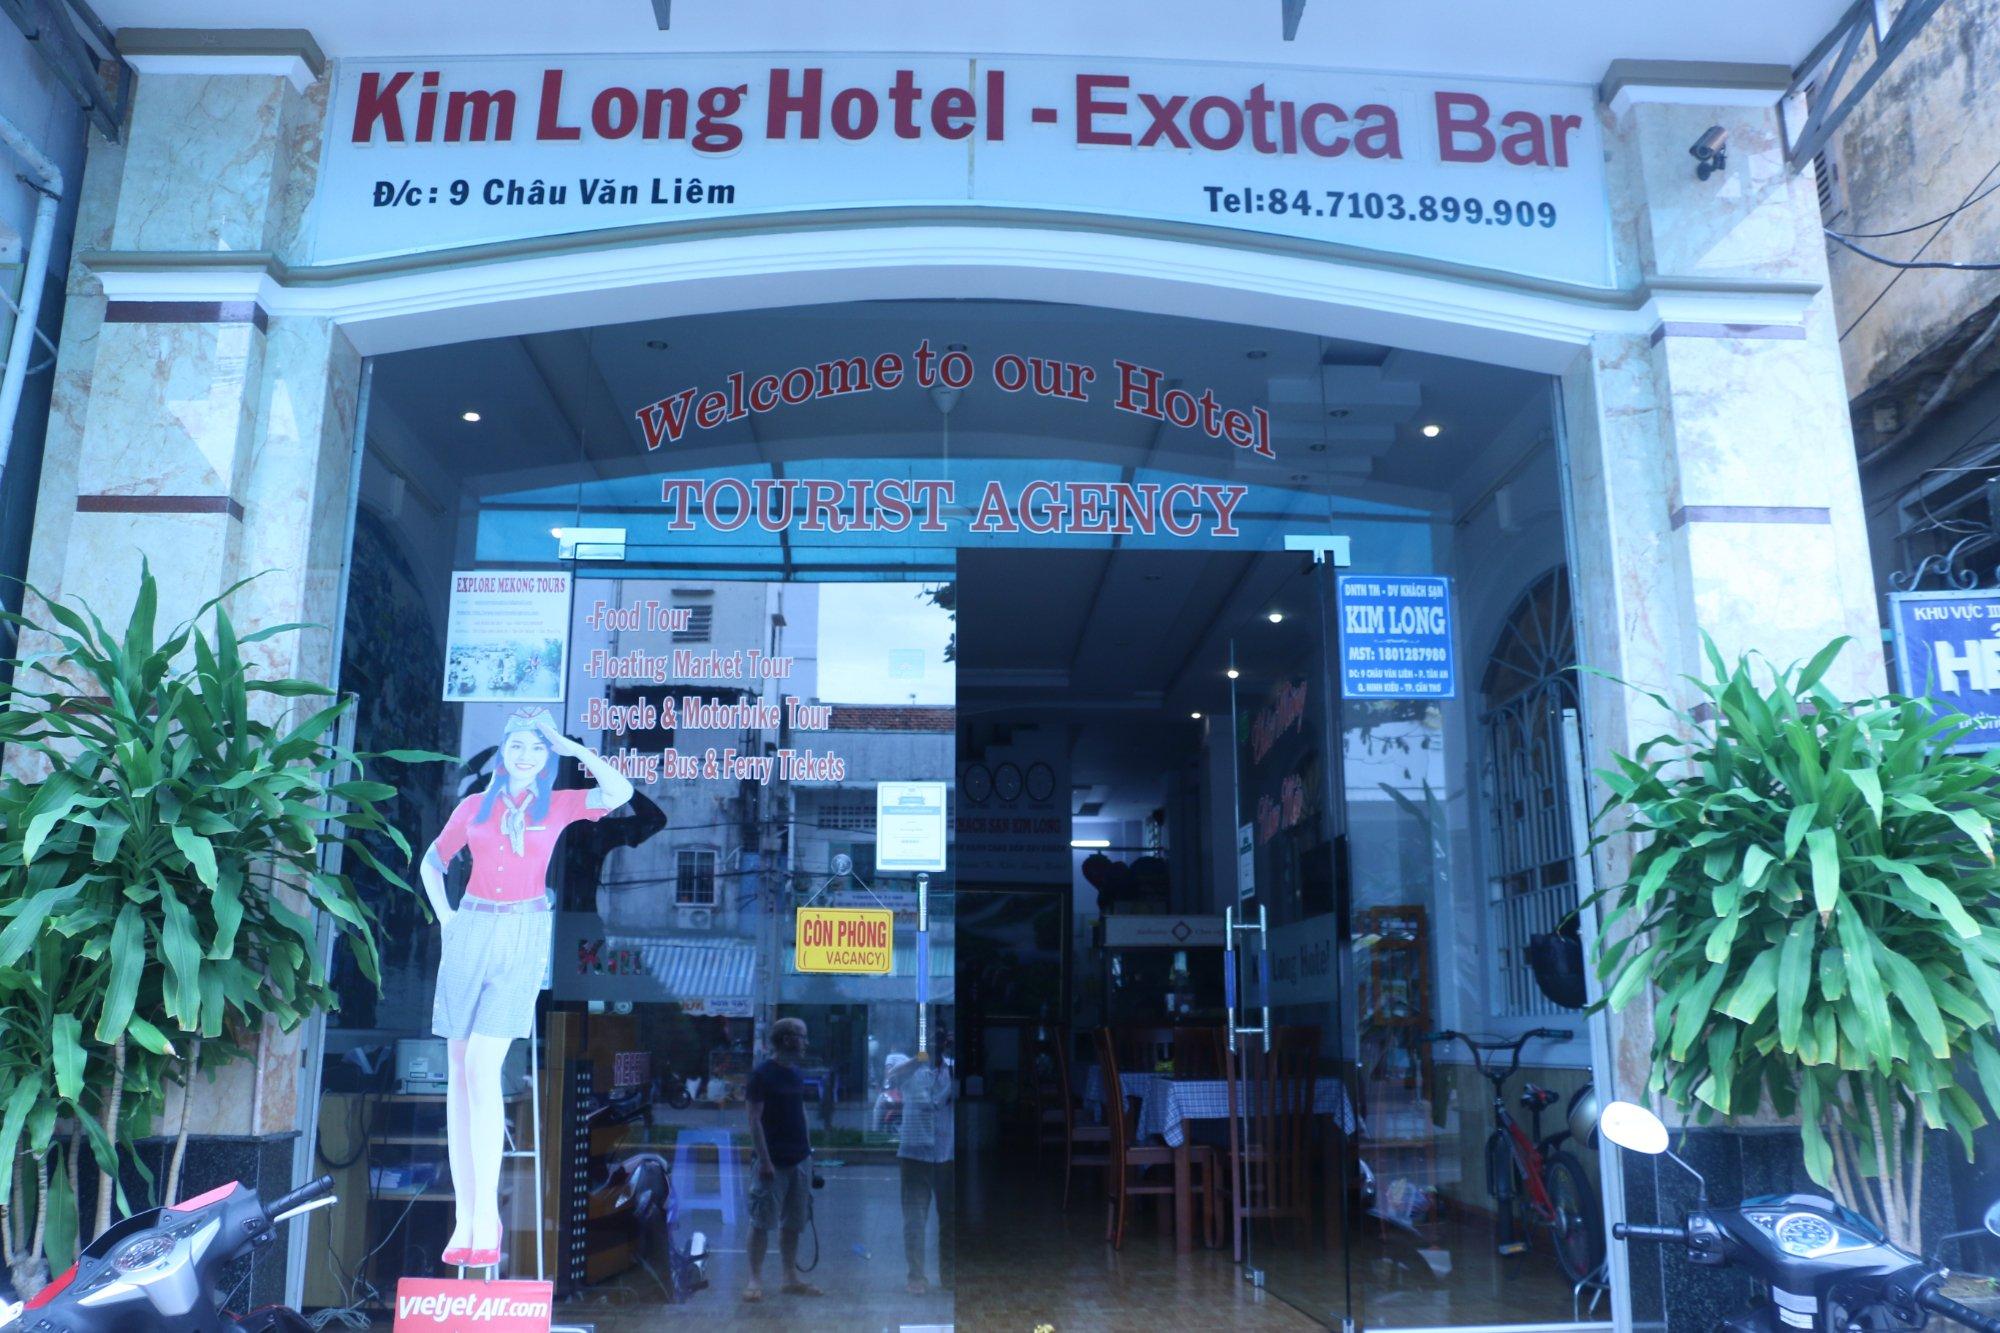 Kim Long Hotel